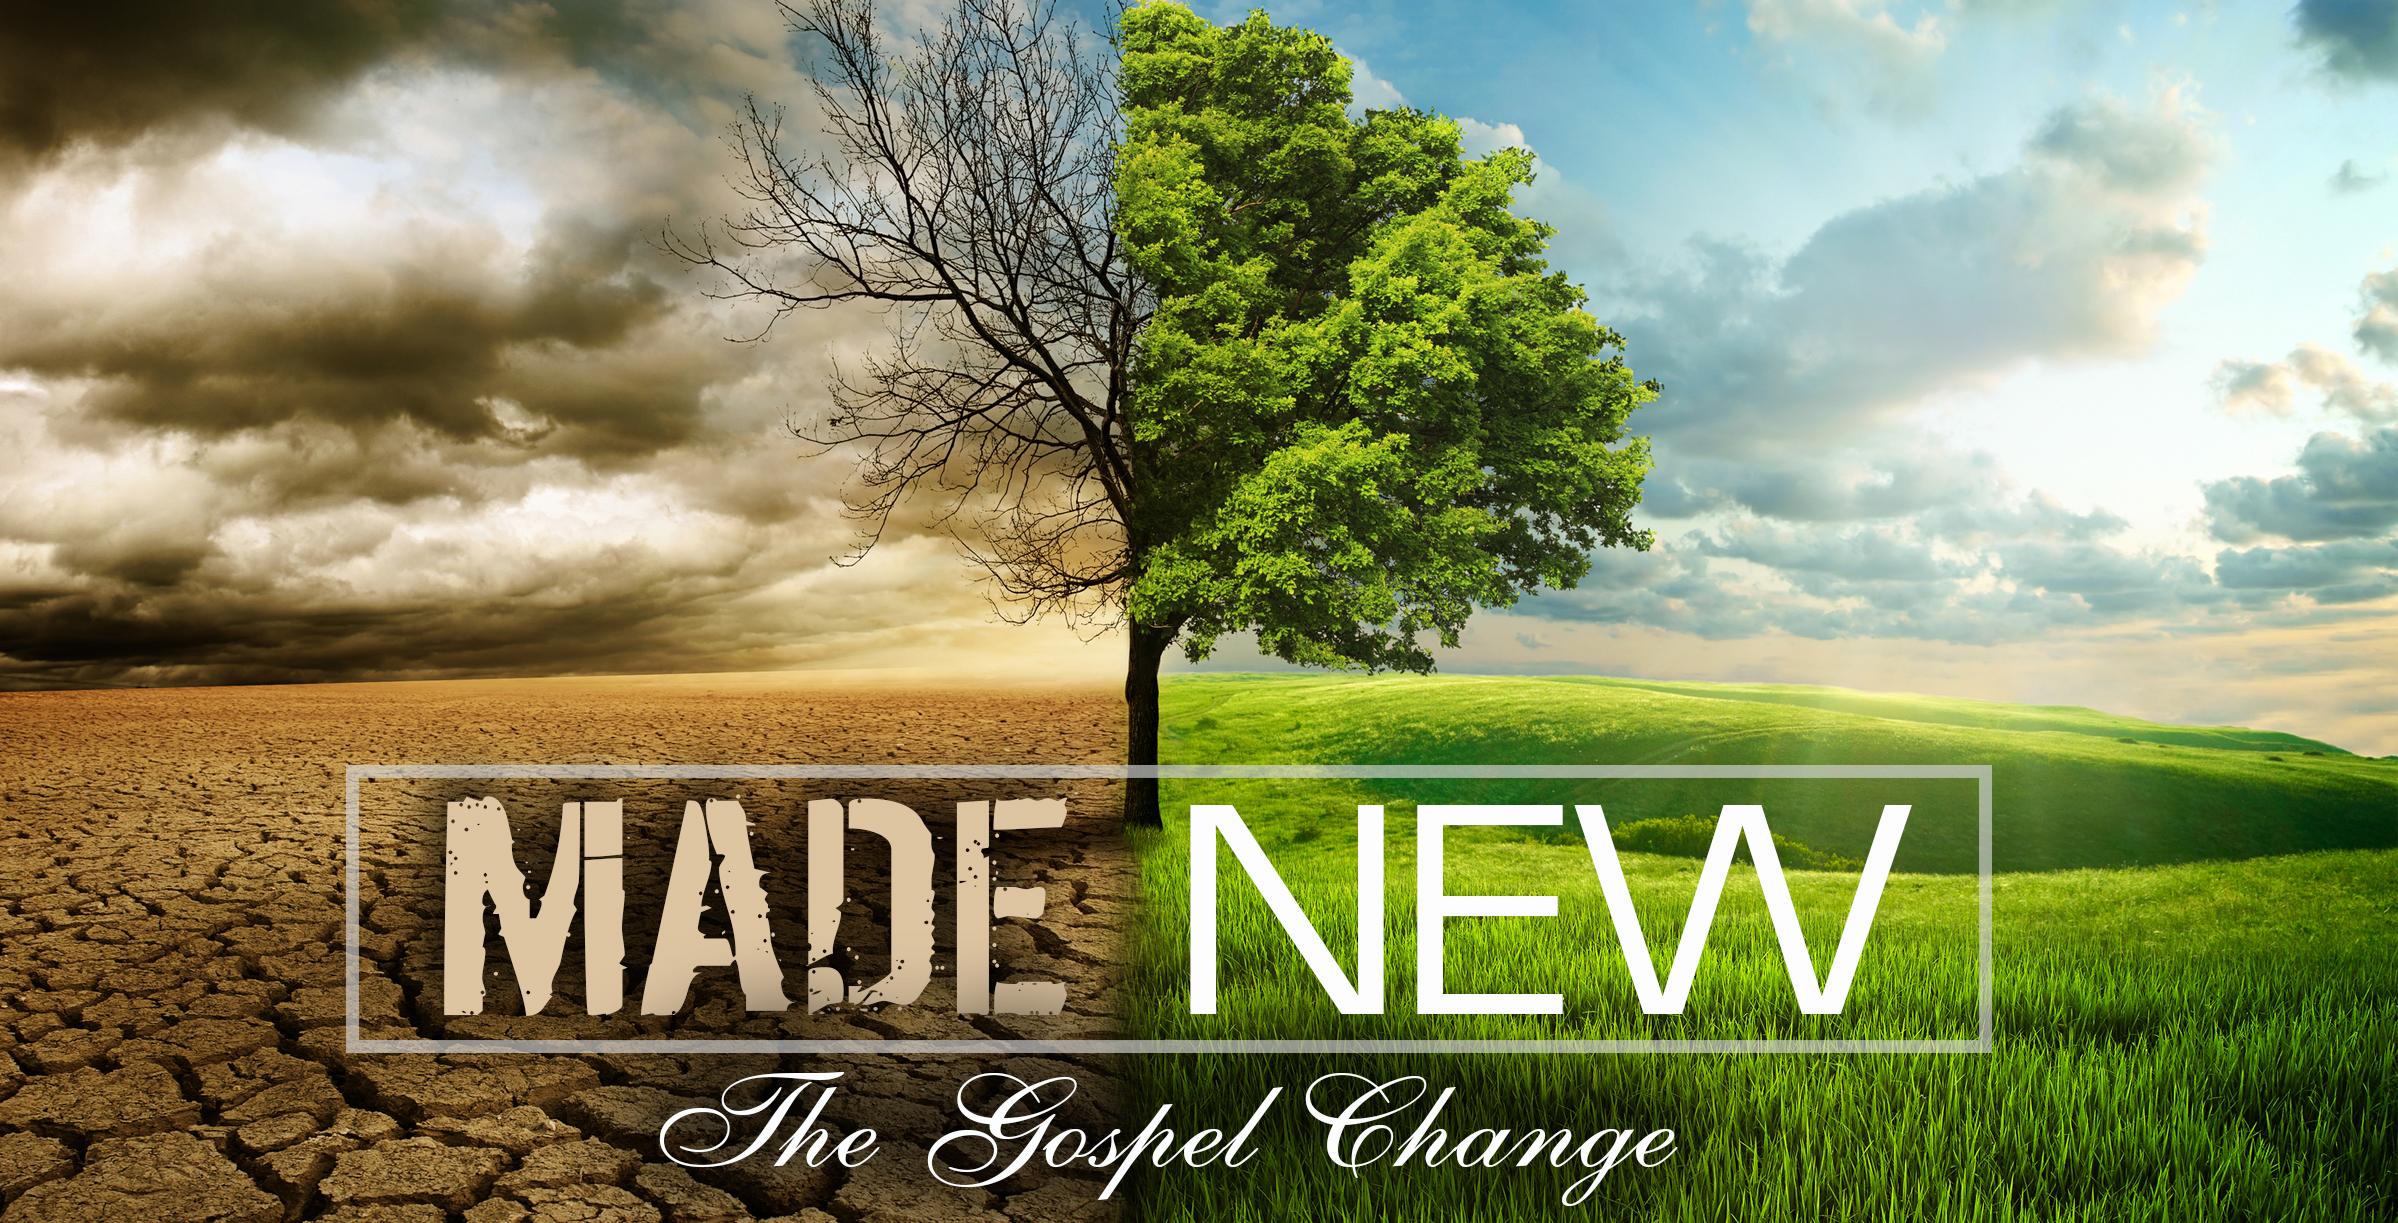 The Gospel Change